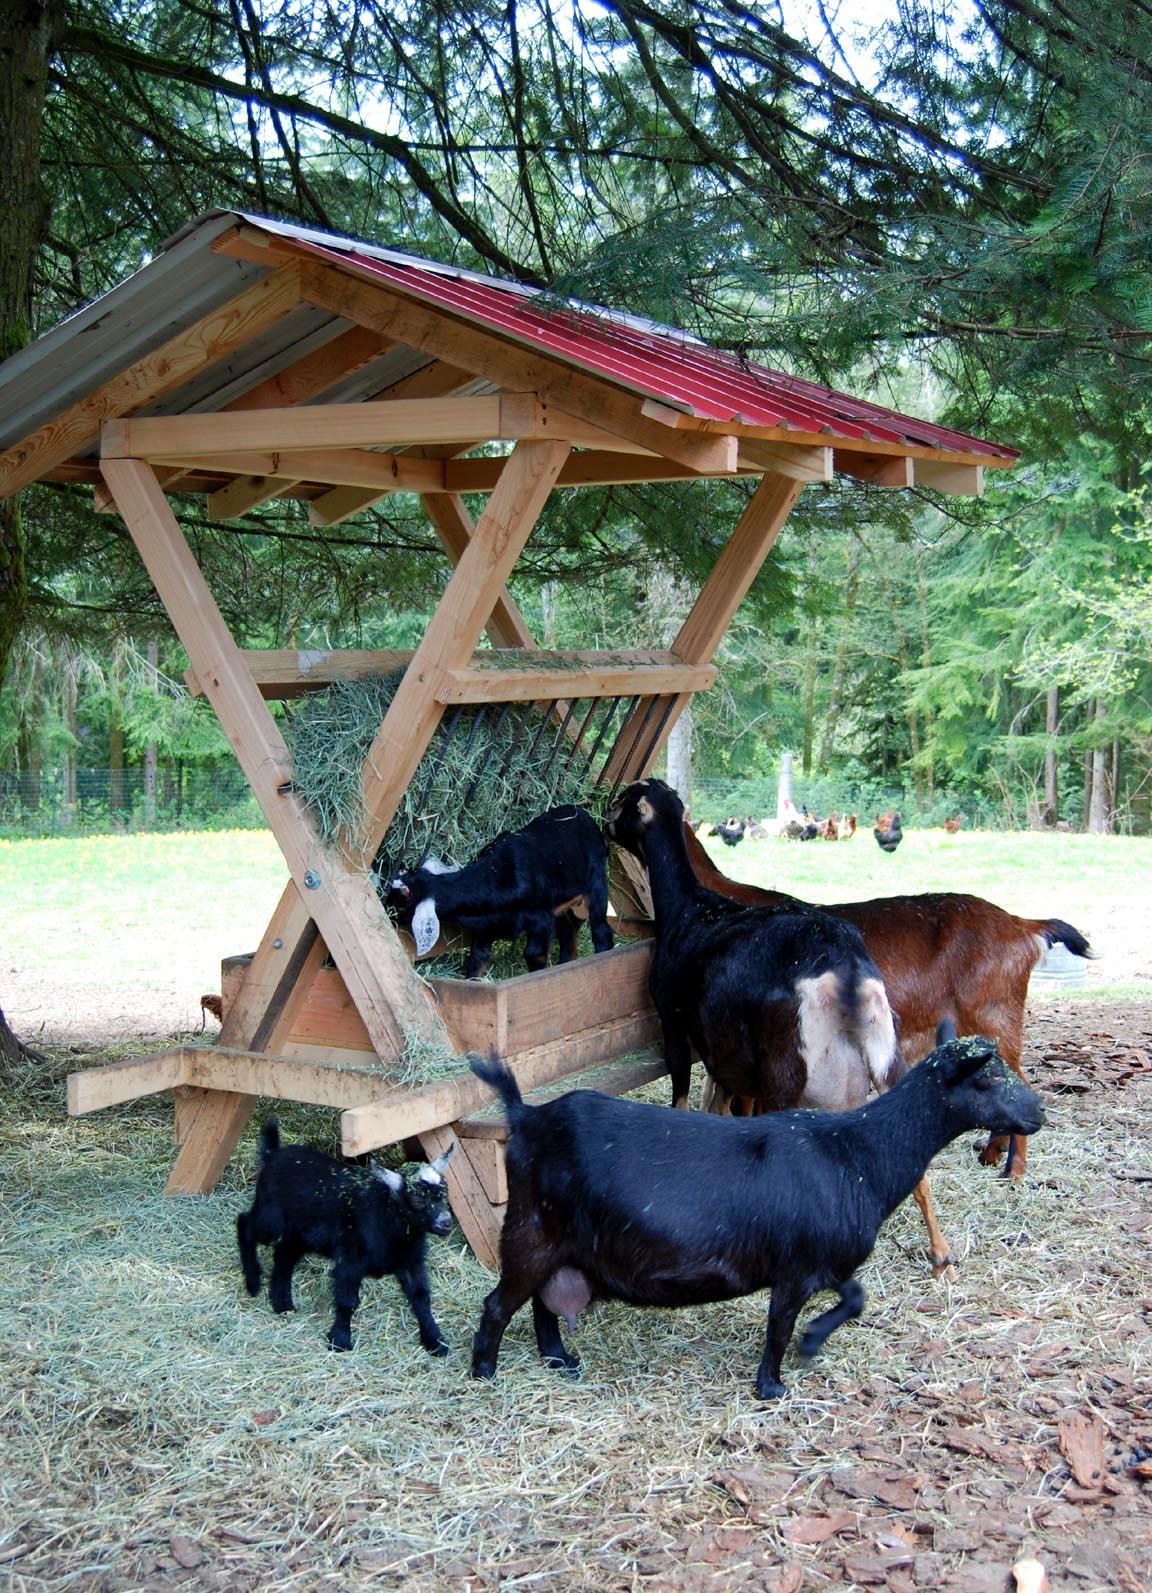 Applegarth farm the spring goat menagerie